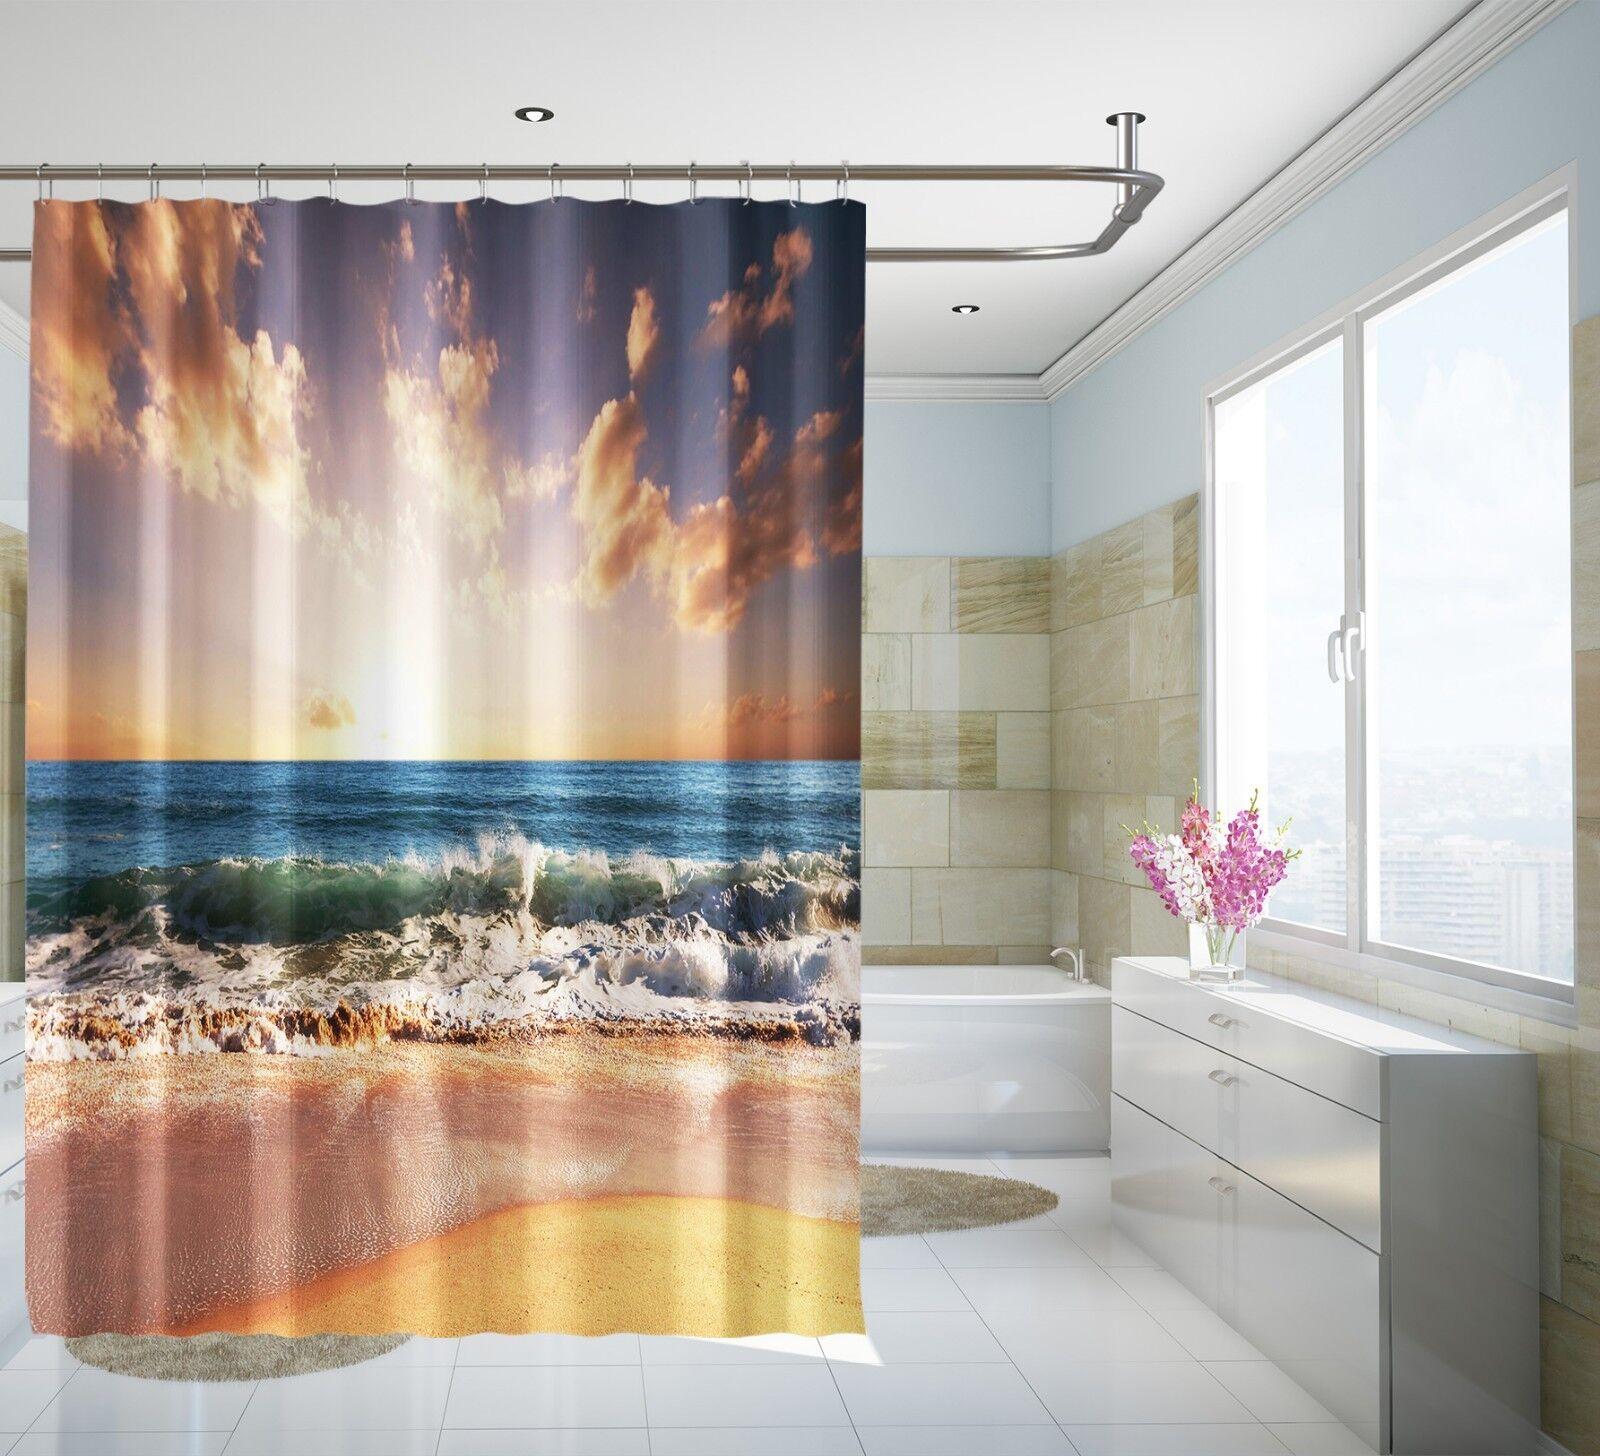 3D Flut Blau 5356 Duschvorhang Wasserdicht Faser Bad Daheim Windows Toilette DE